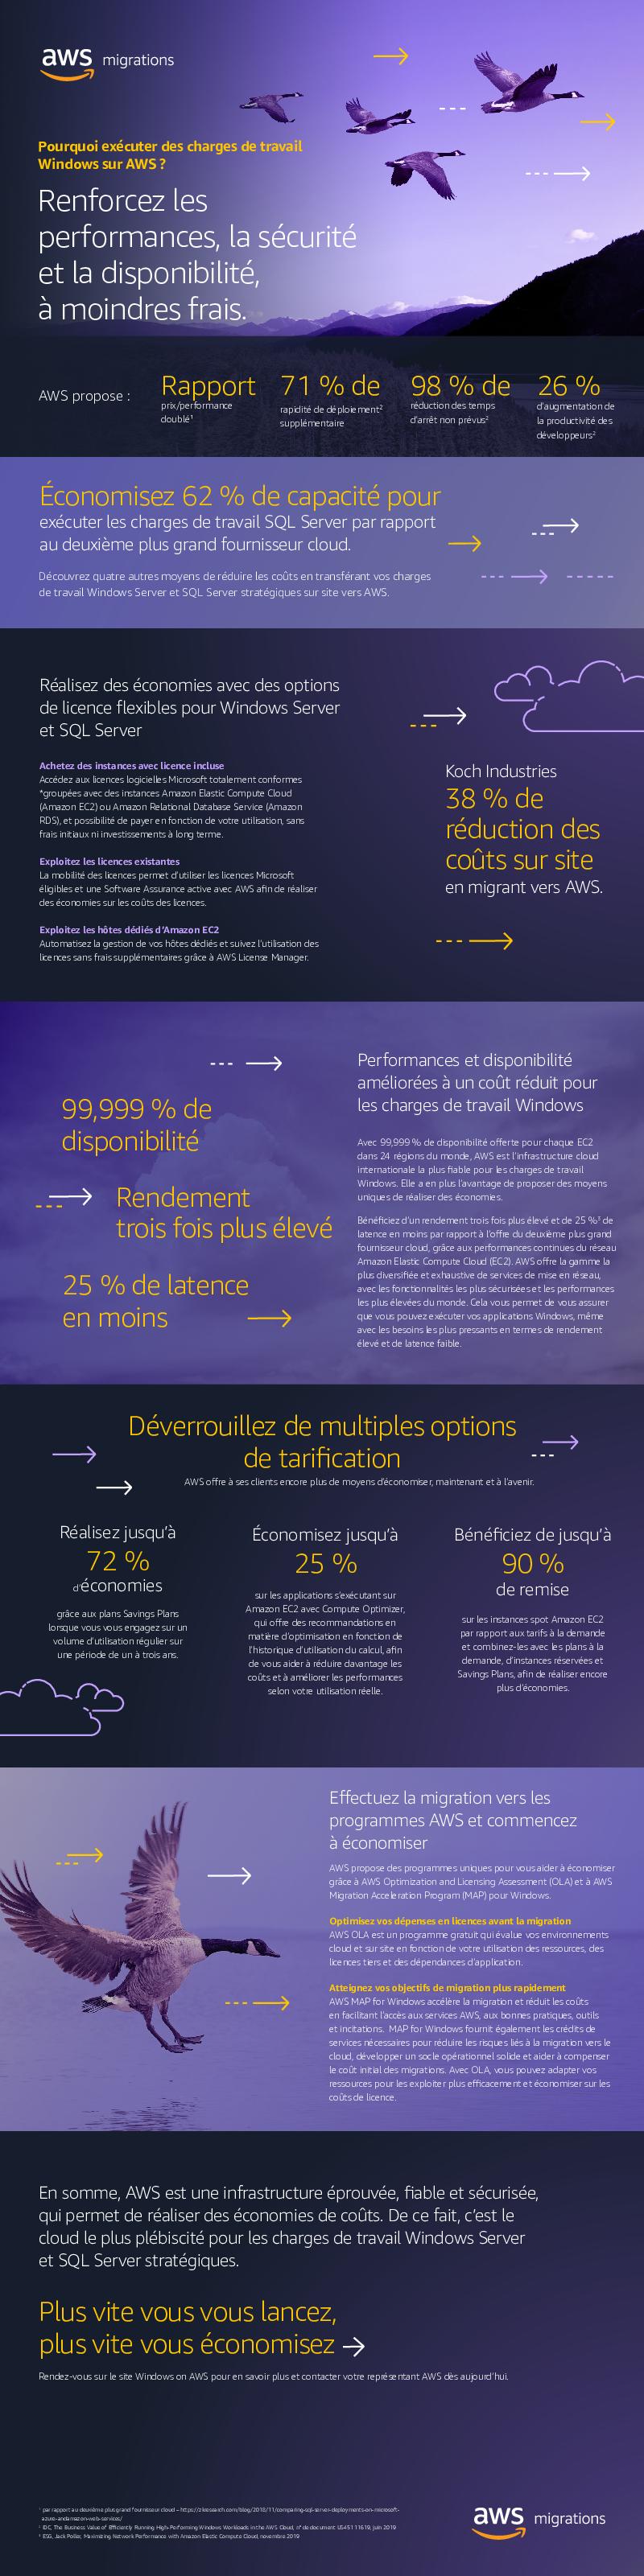 Square cropped thumb original cost savings infographic fr fr b9b2551d2ccd9095